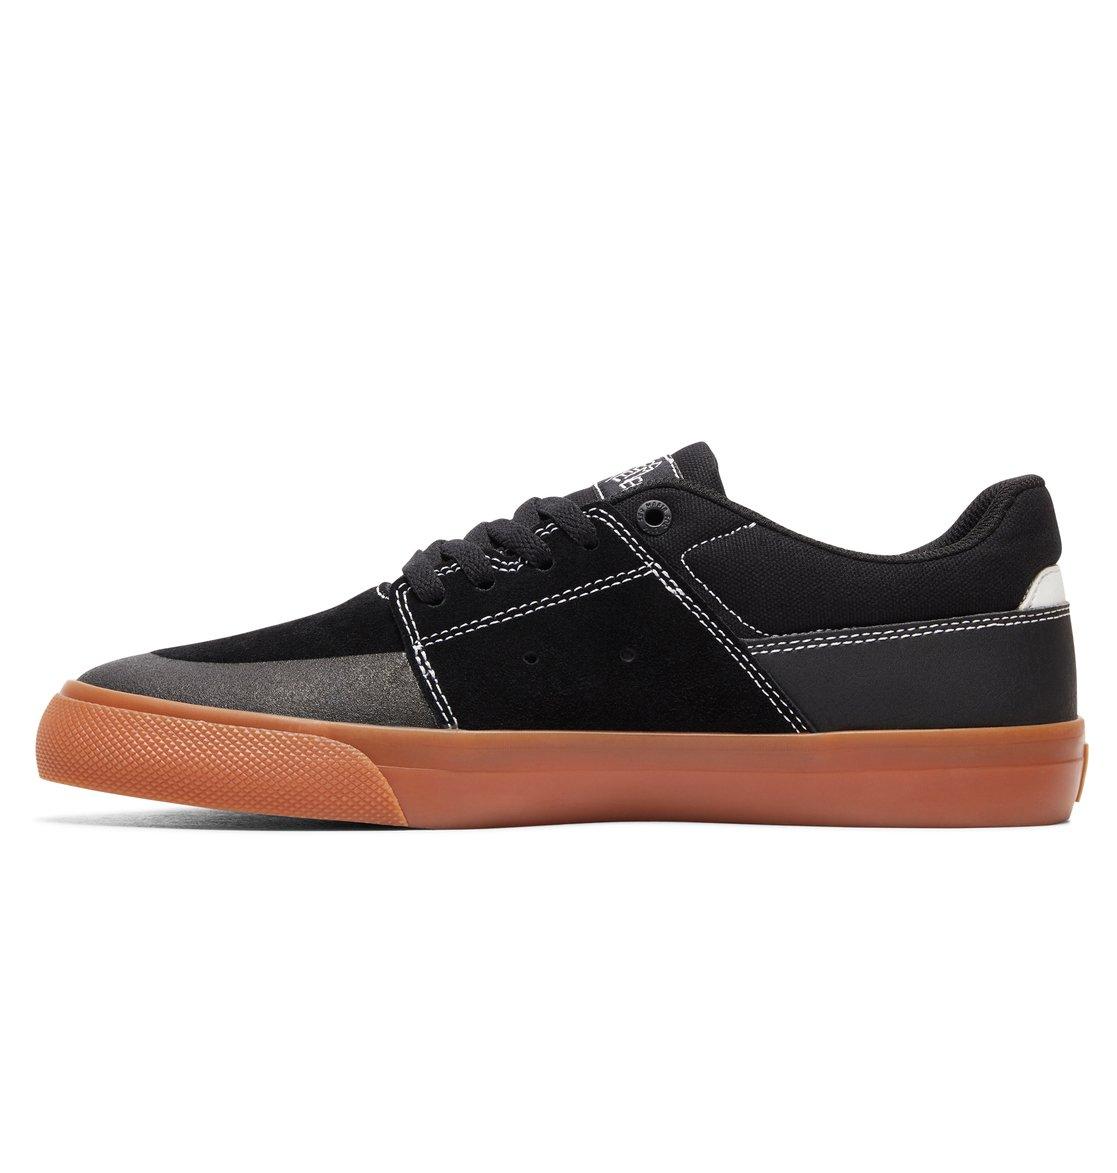 Dc ™ Chaussures Wes Shoes Adys300315 Kremer KFuc5T1lJ3